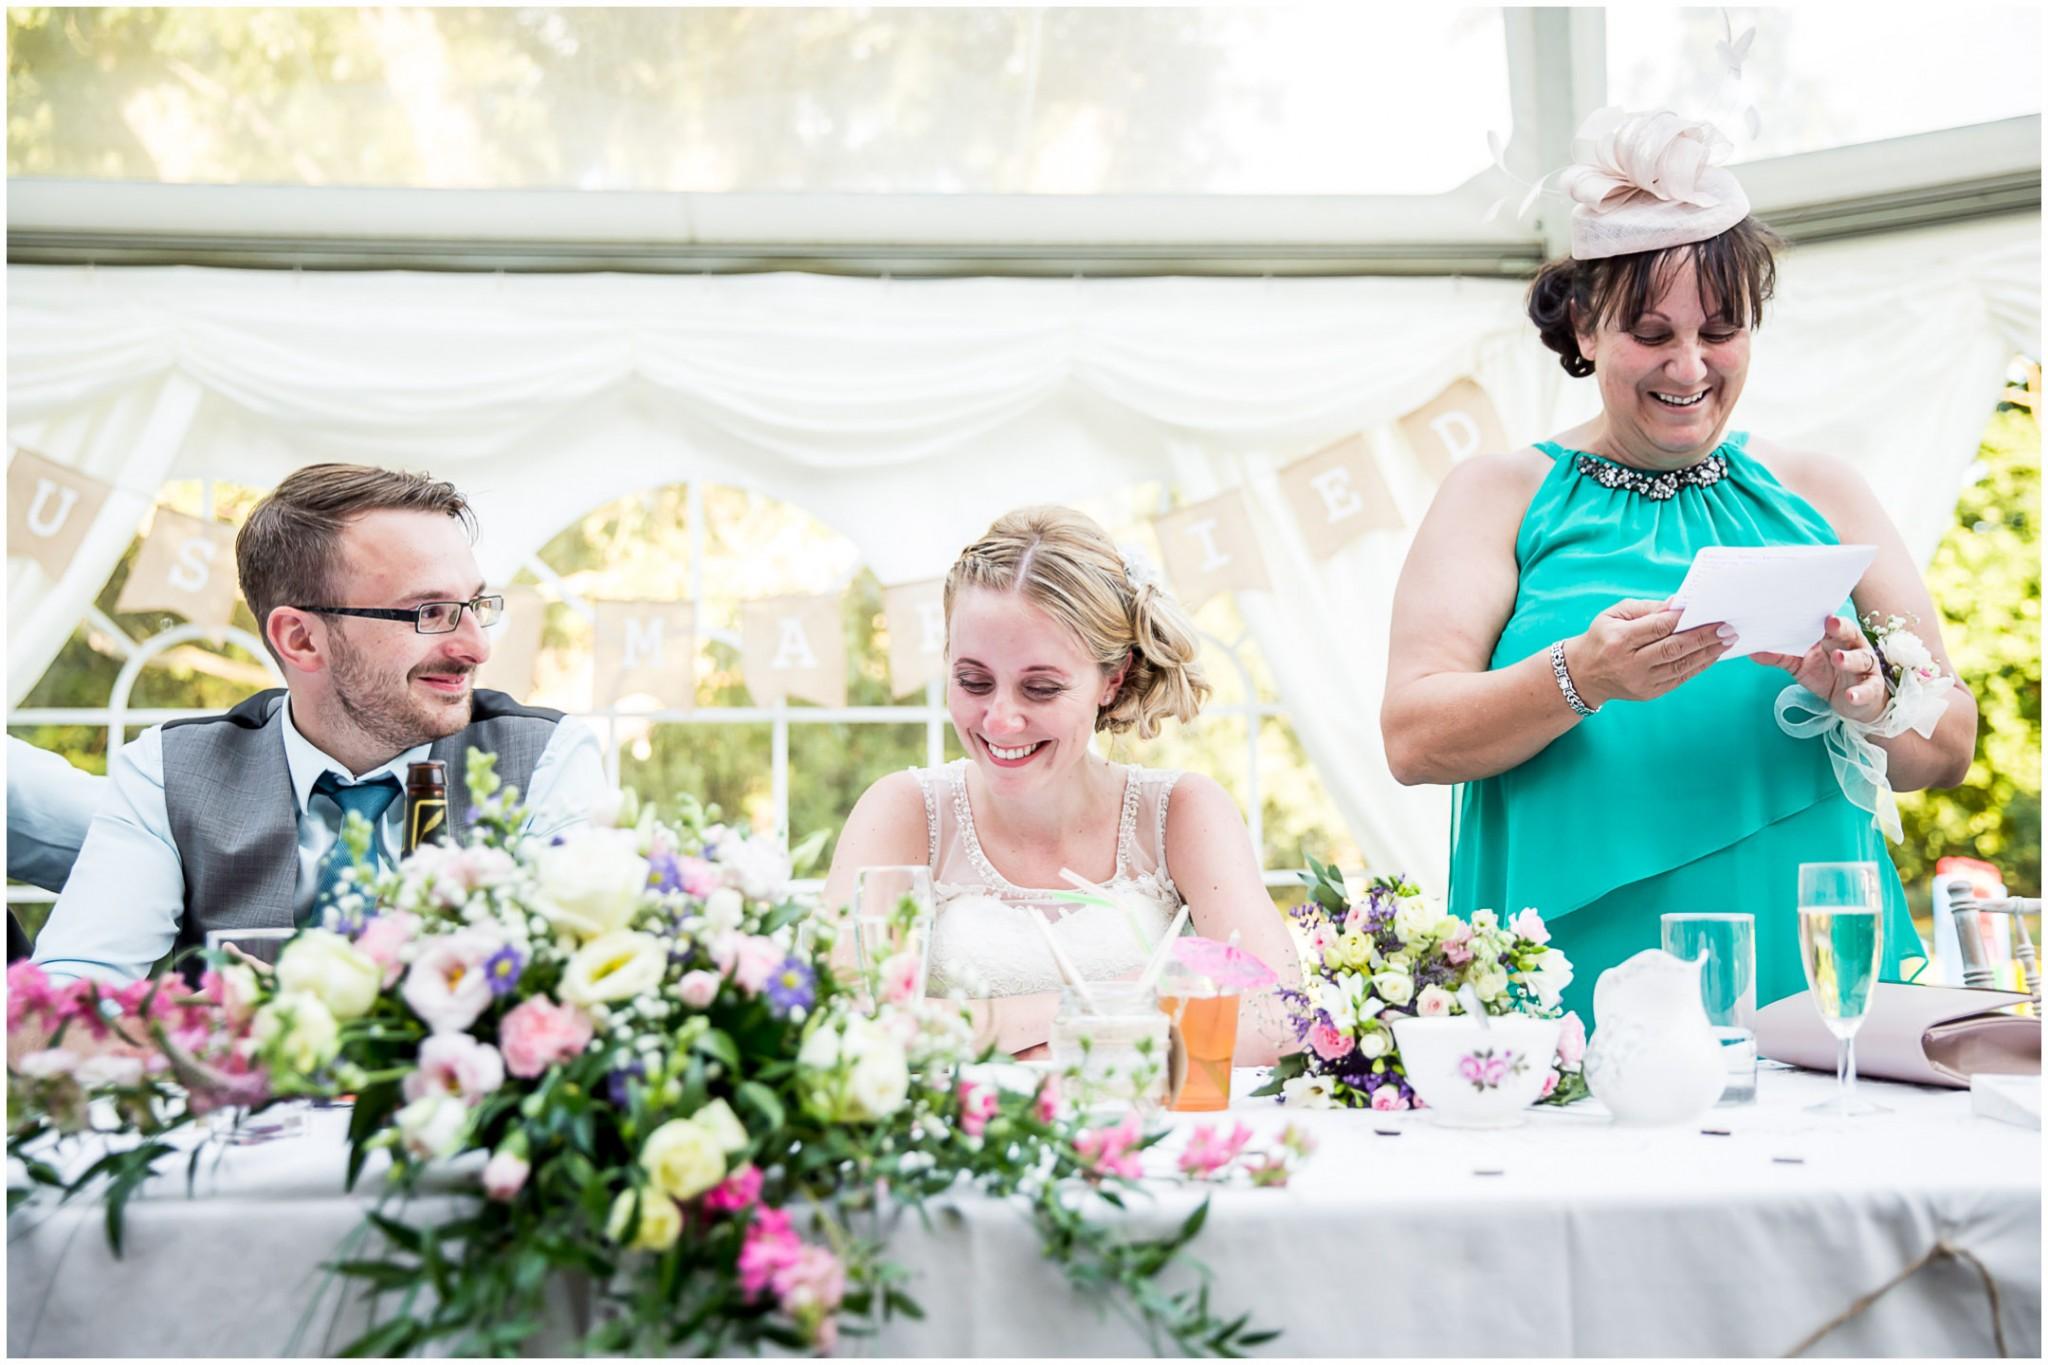 Tournerbury Woods Estate Wedding Mother of the Bride's speech